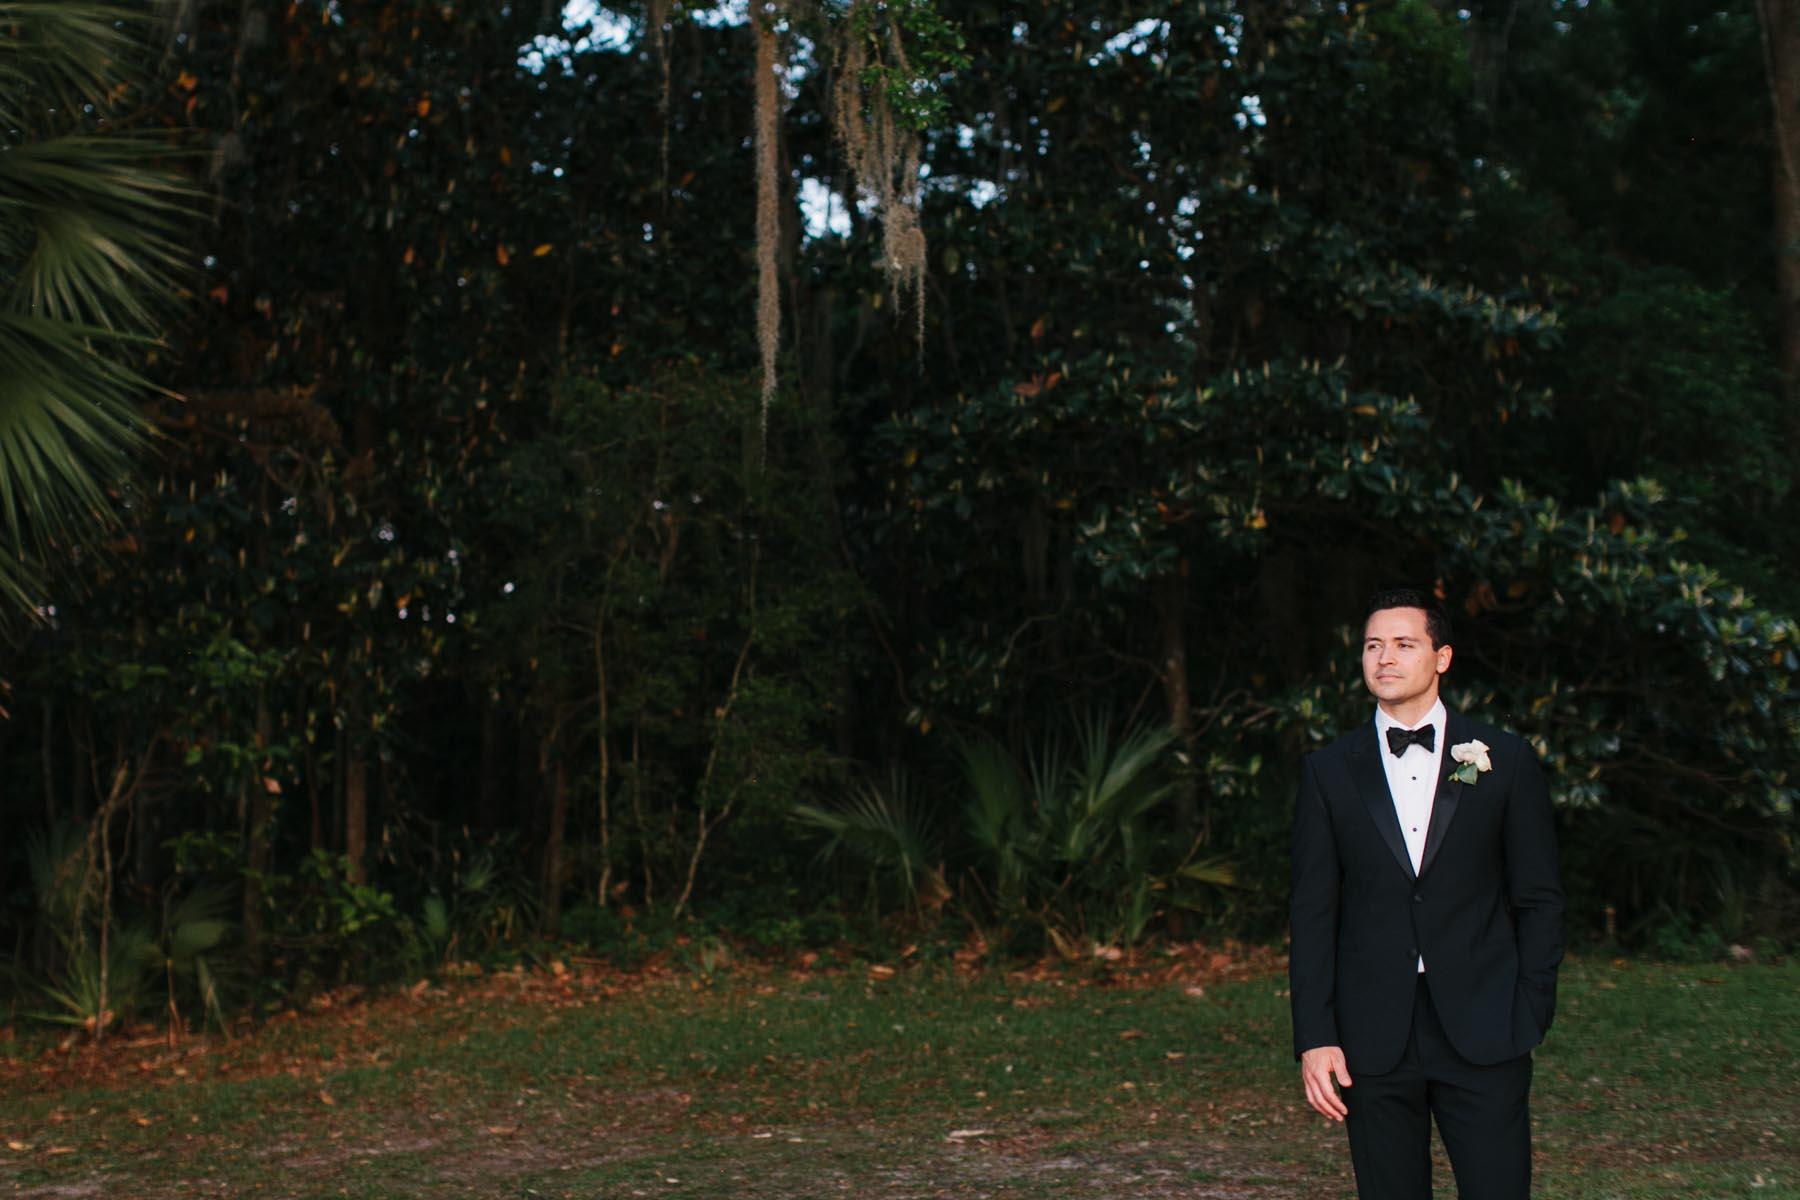 lowry wedding blog eden garden florida wedding-97